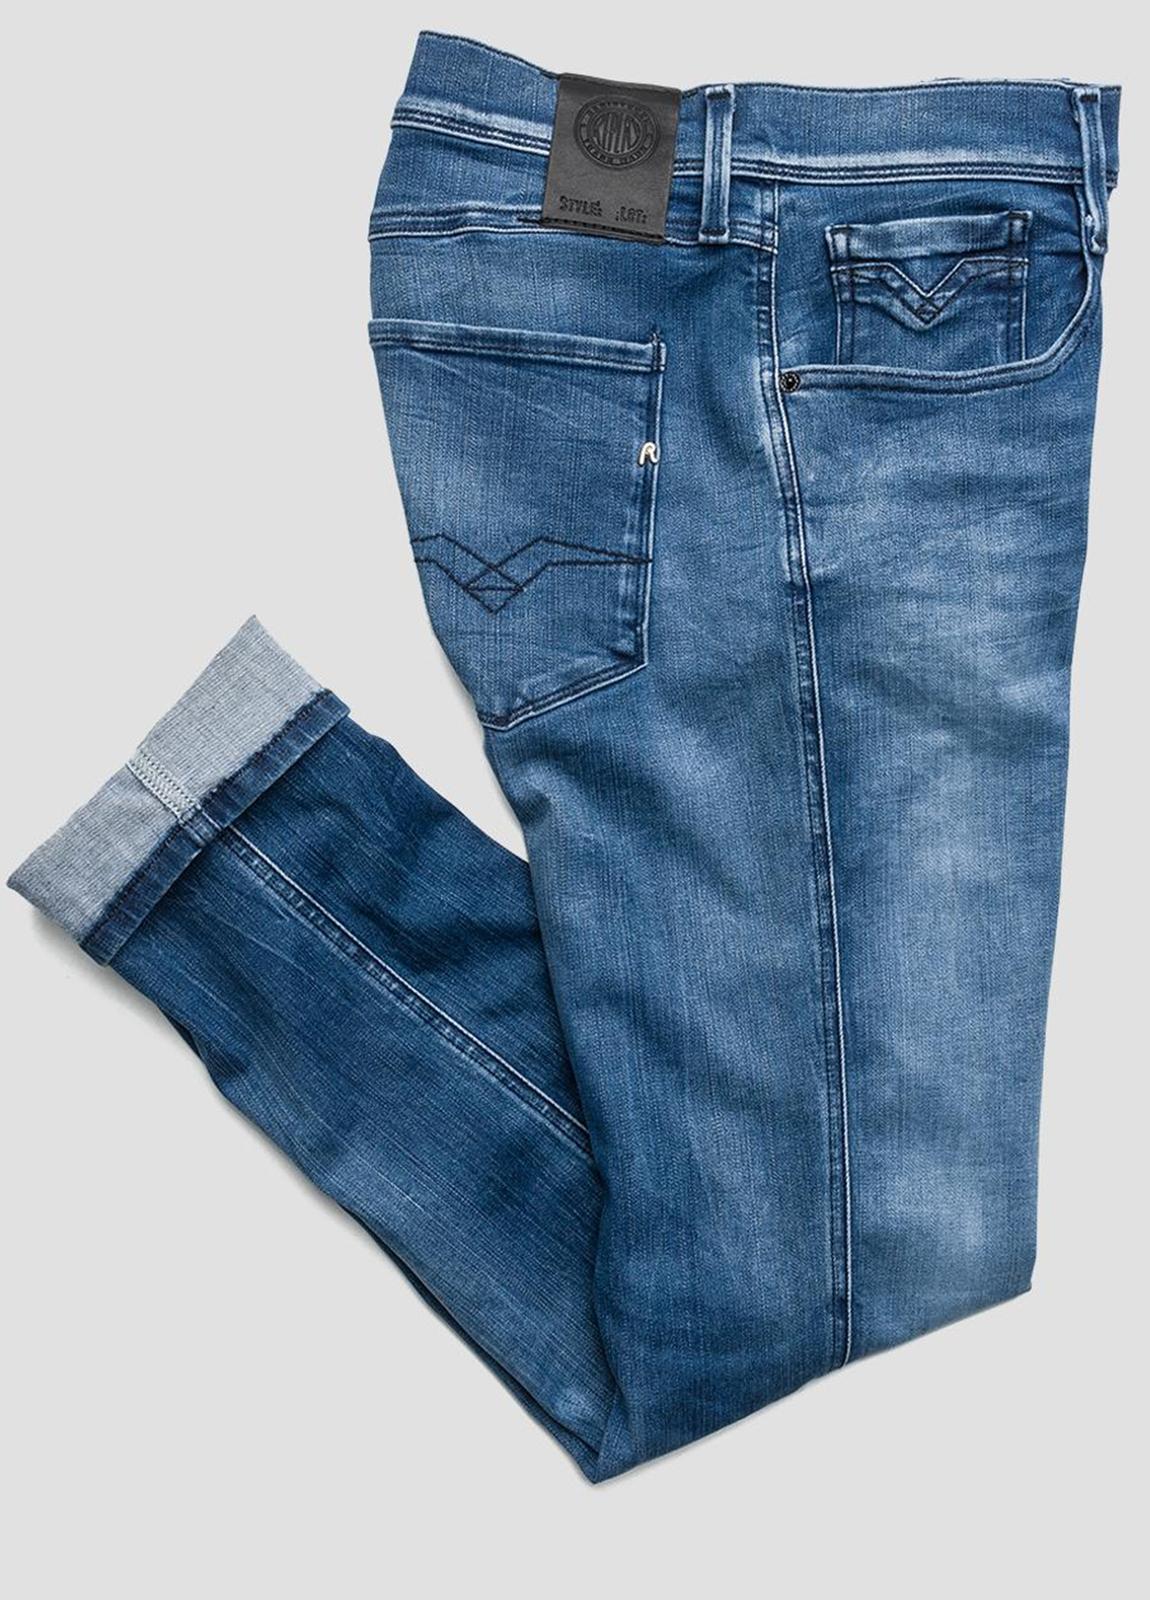 Pantalón tejano 11,5 oz SLIM 914 ANBASS color azul medio lavado. 85% Algodón 10% Poliéster 5% Elastáno.